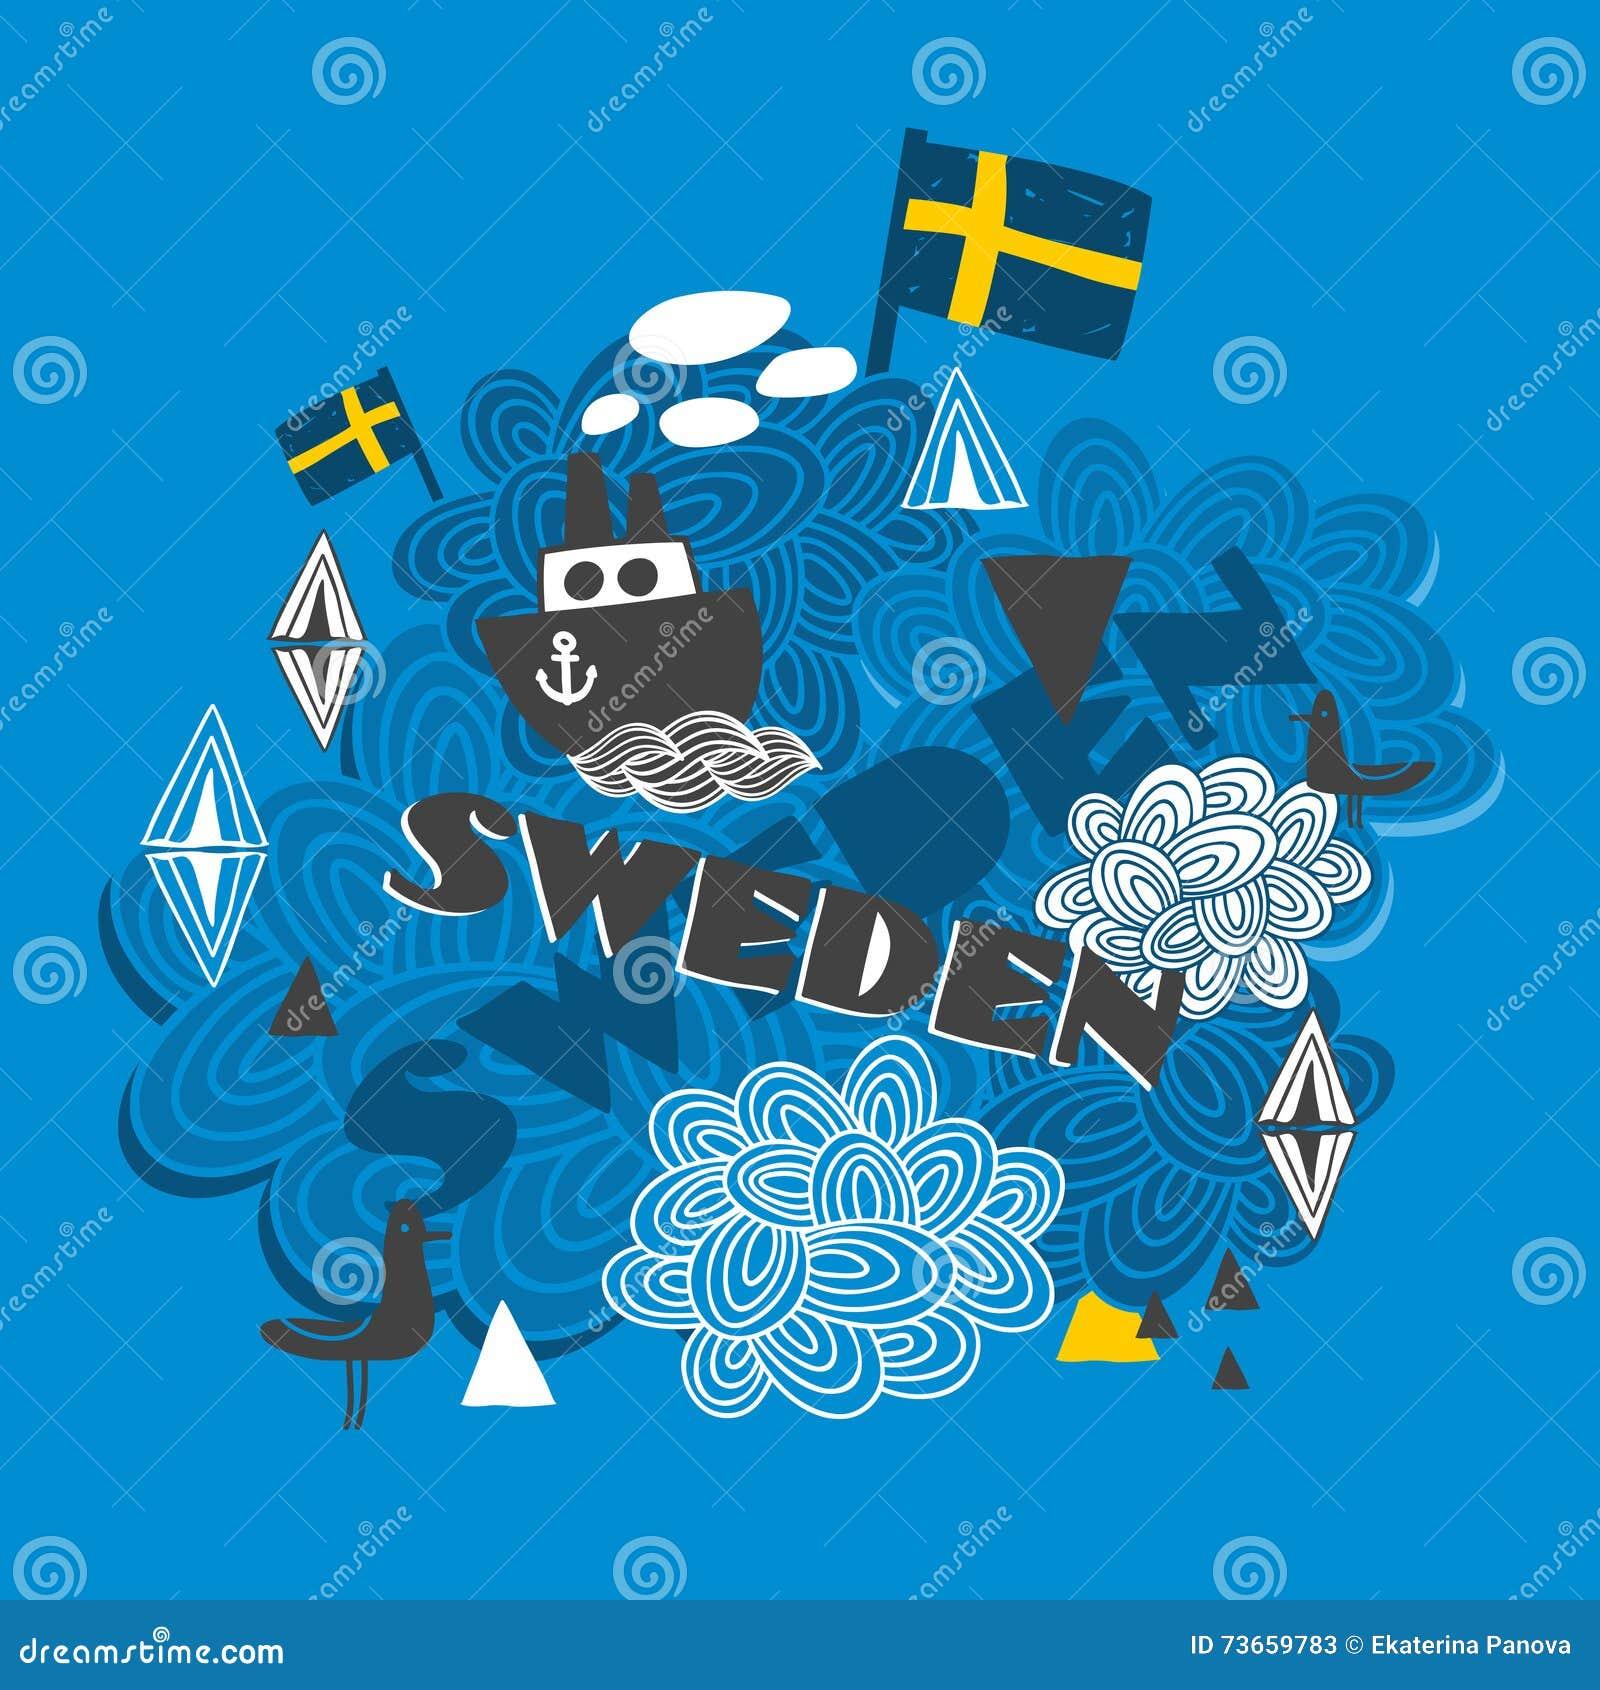 Cool pattern with swedish symbols stock vector illustration of cool pattern with swedish symbols buycottarizona